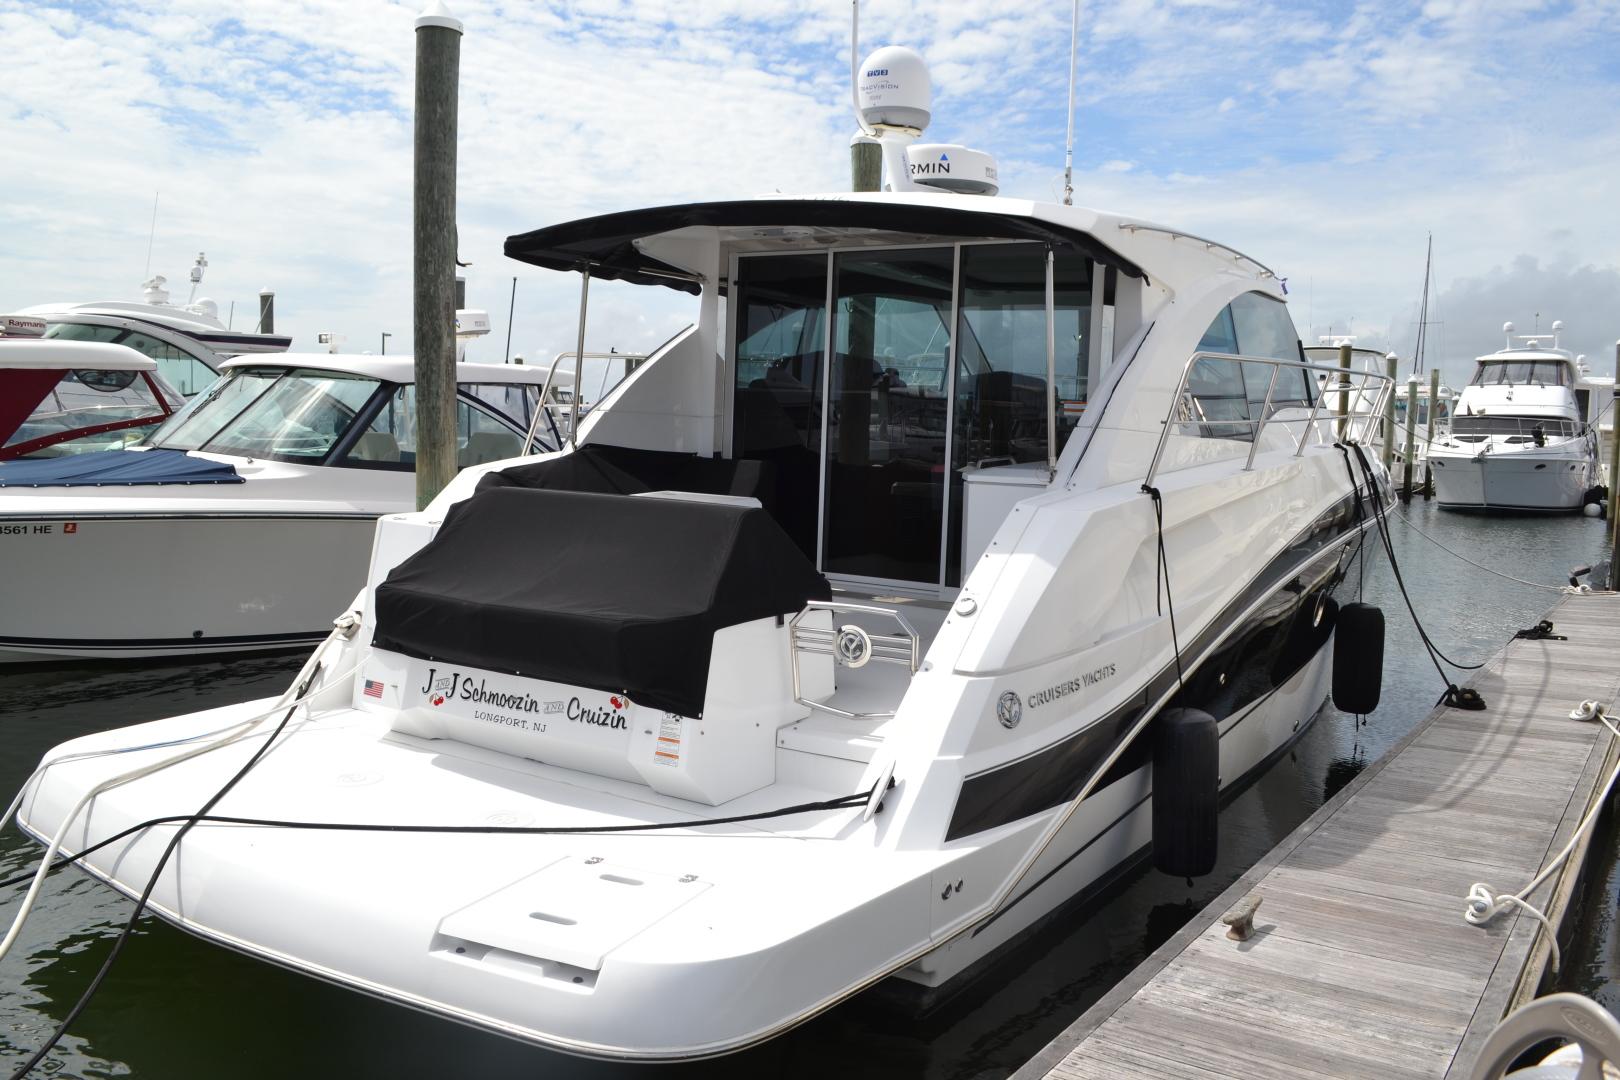 Cruisers-41 Cantius 2016-J&J Shmoozin and Cruzin Annapolis-Maryland-United States-1622212 | Thumbnail